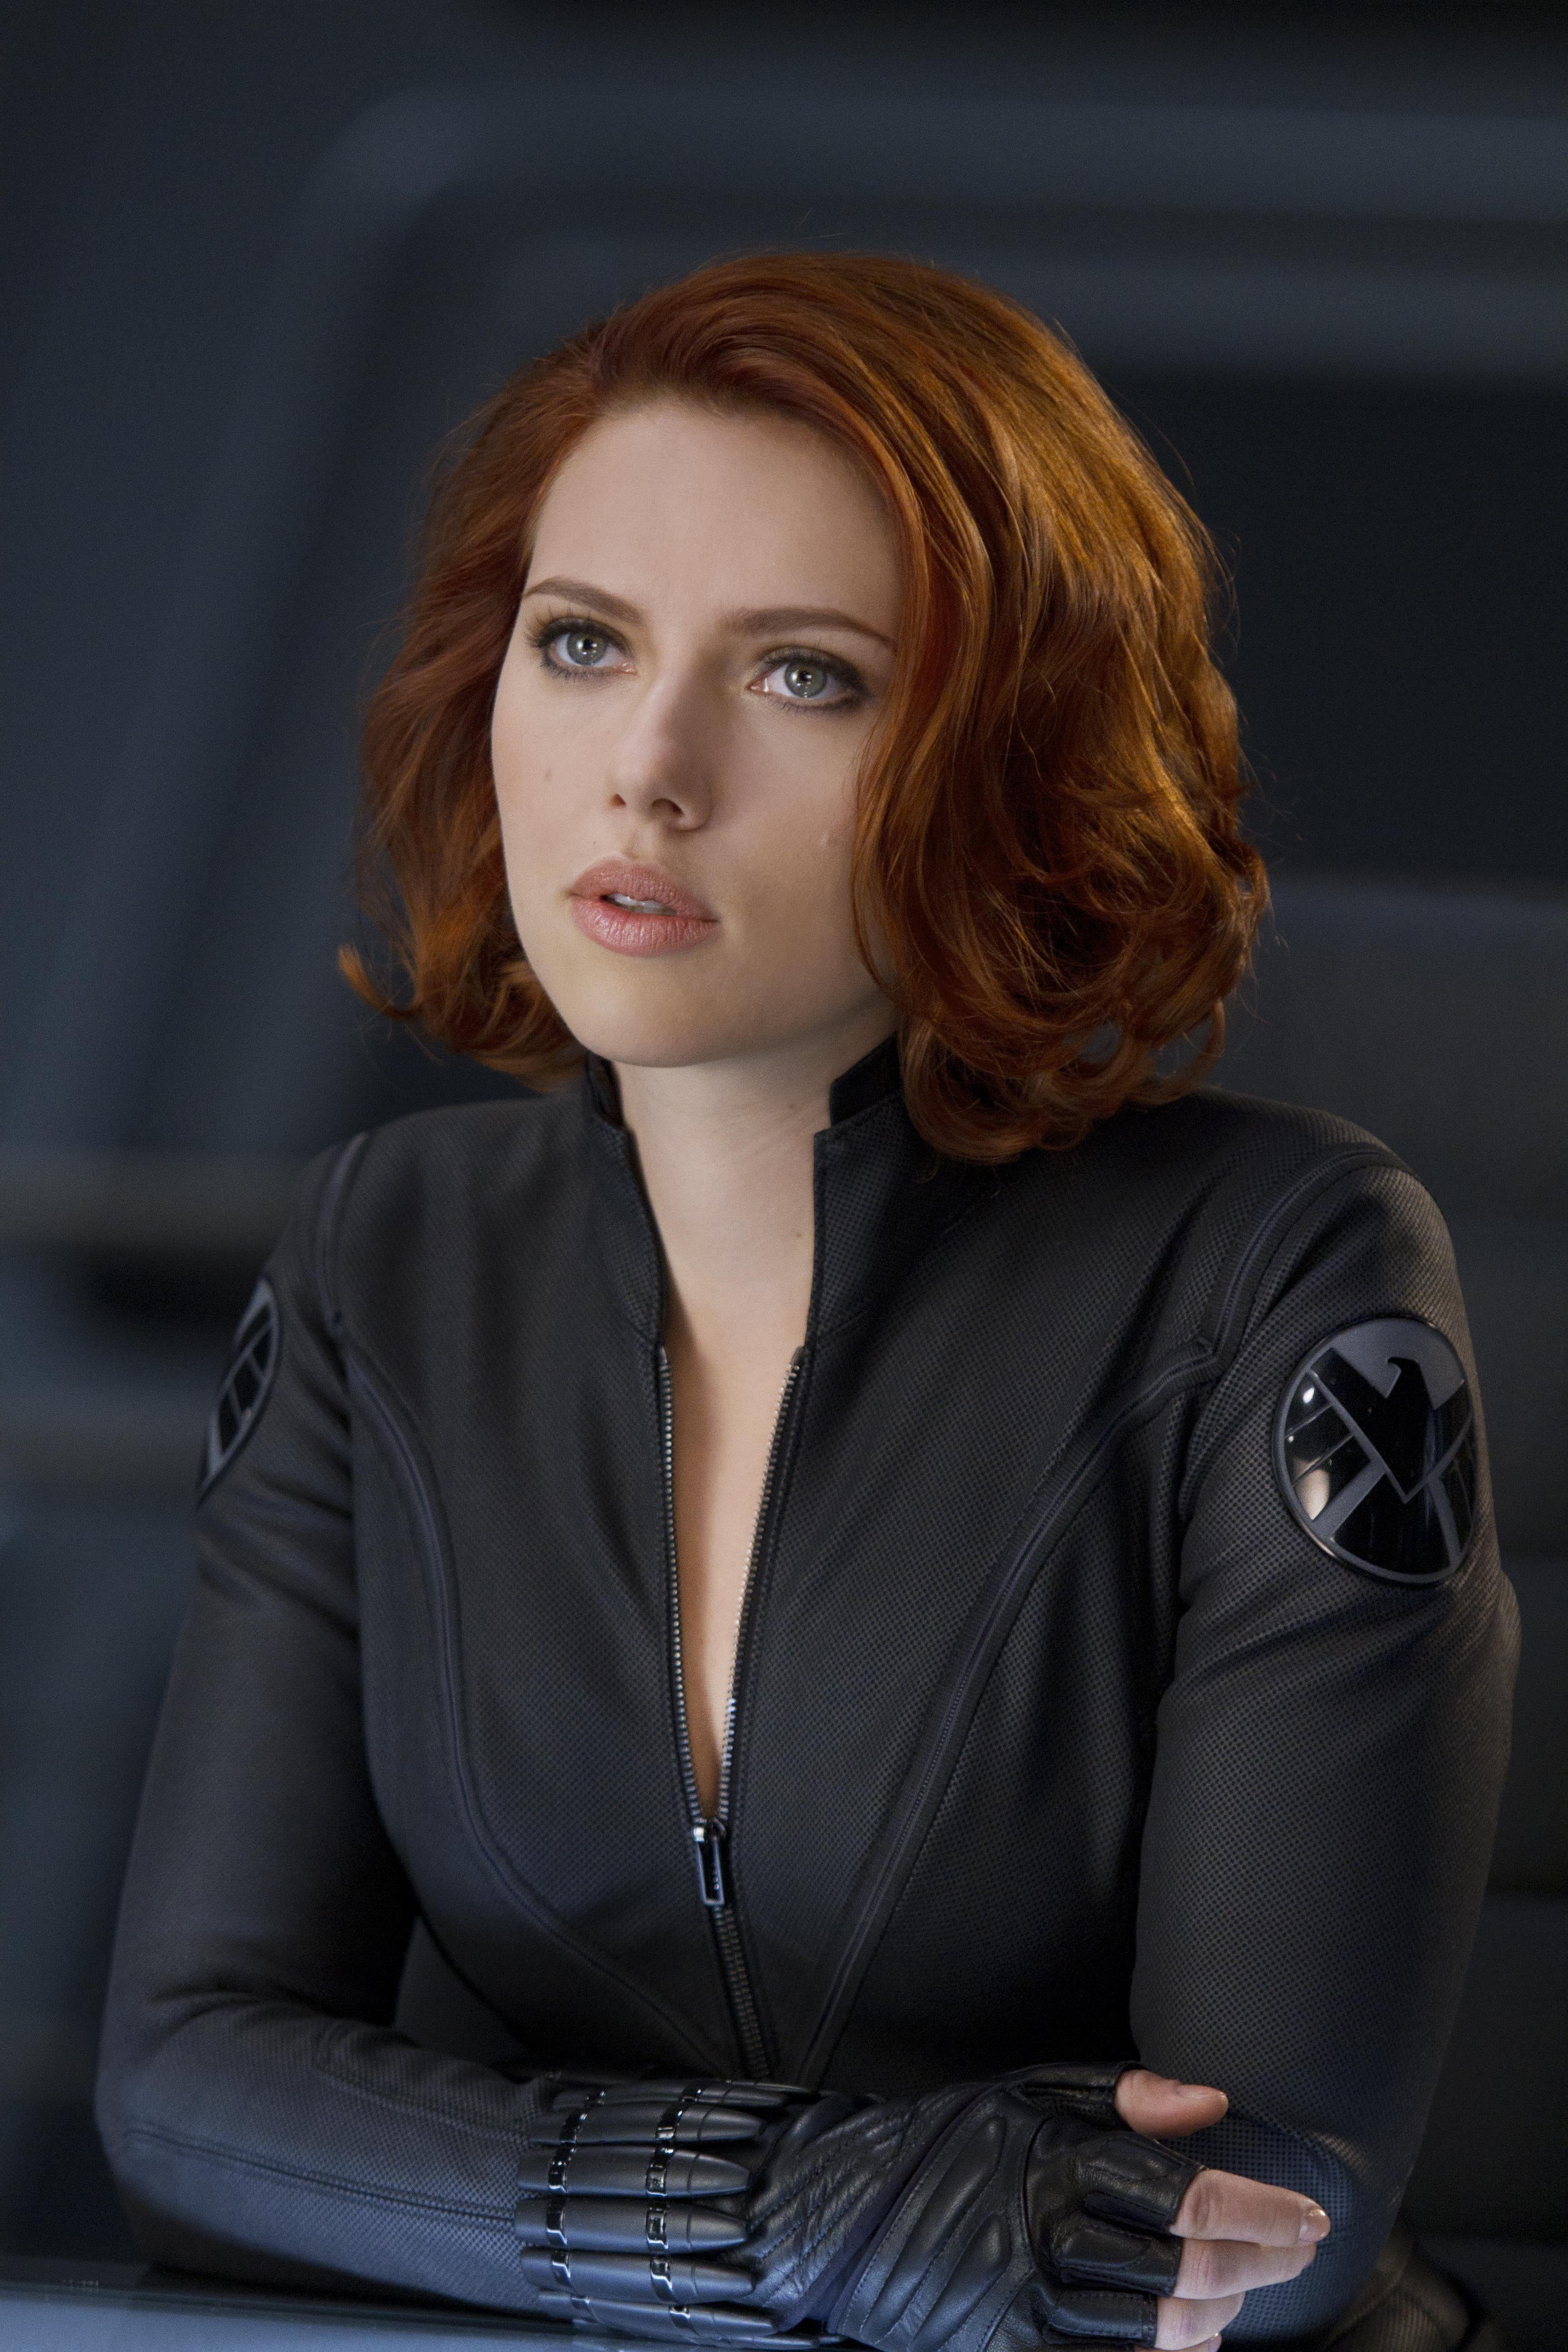 women's black zipup jacket women actress redhead Scarlett Johansson S H I E L D  Black Widow portrait display 5K wallpaper hdwallpaper desktop is part of Black widow avengers -